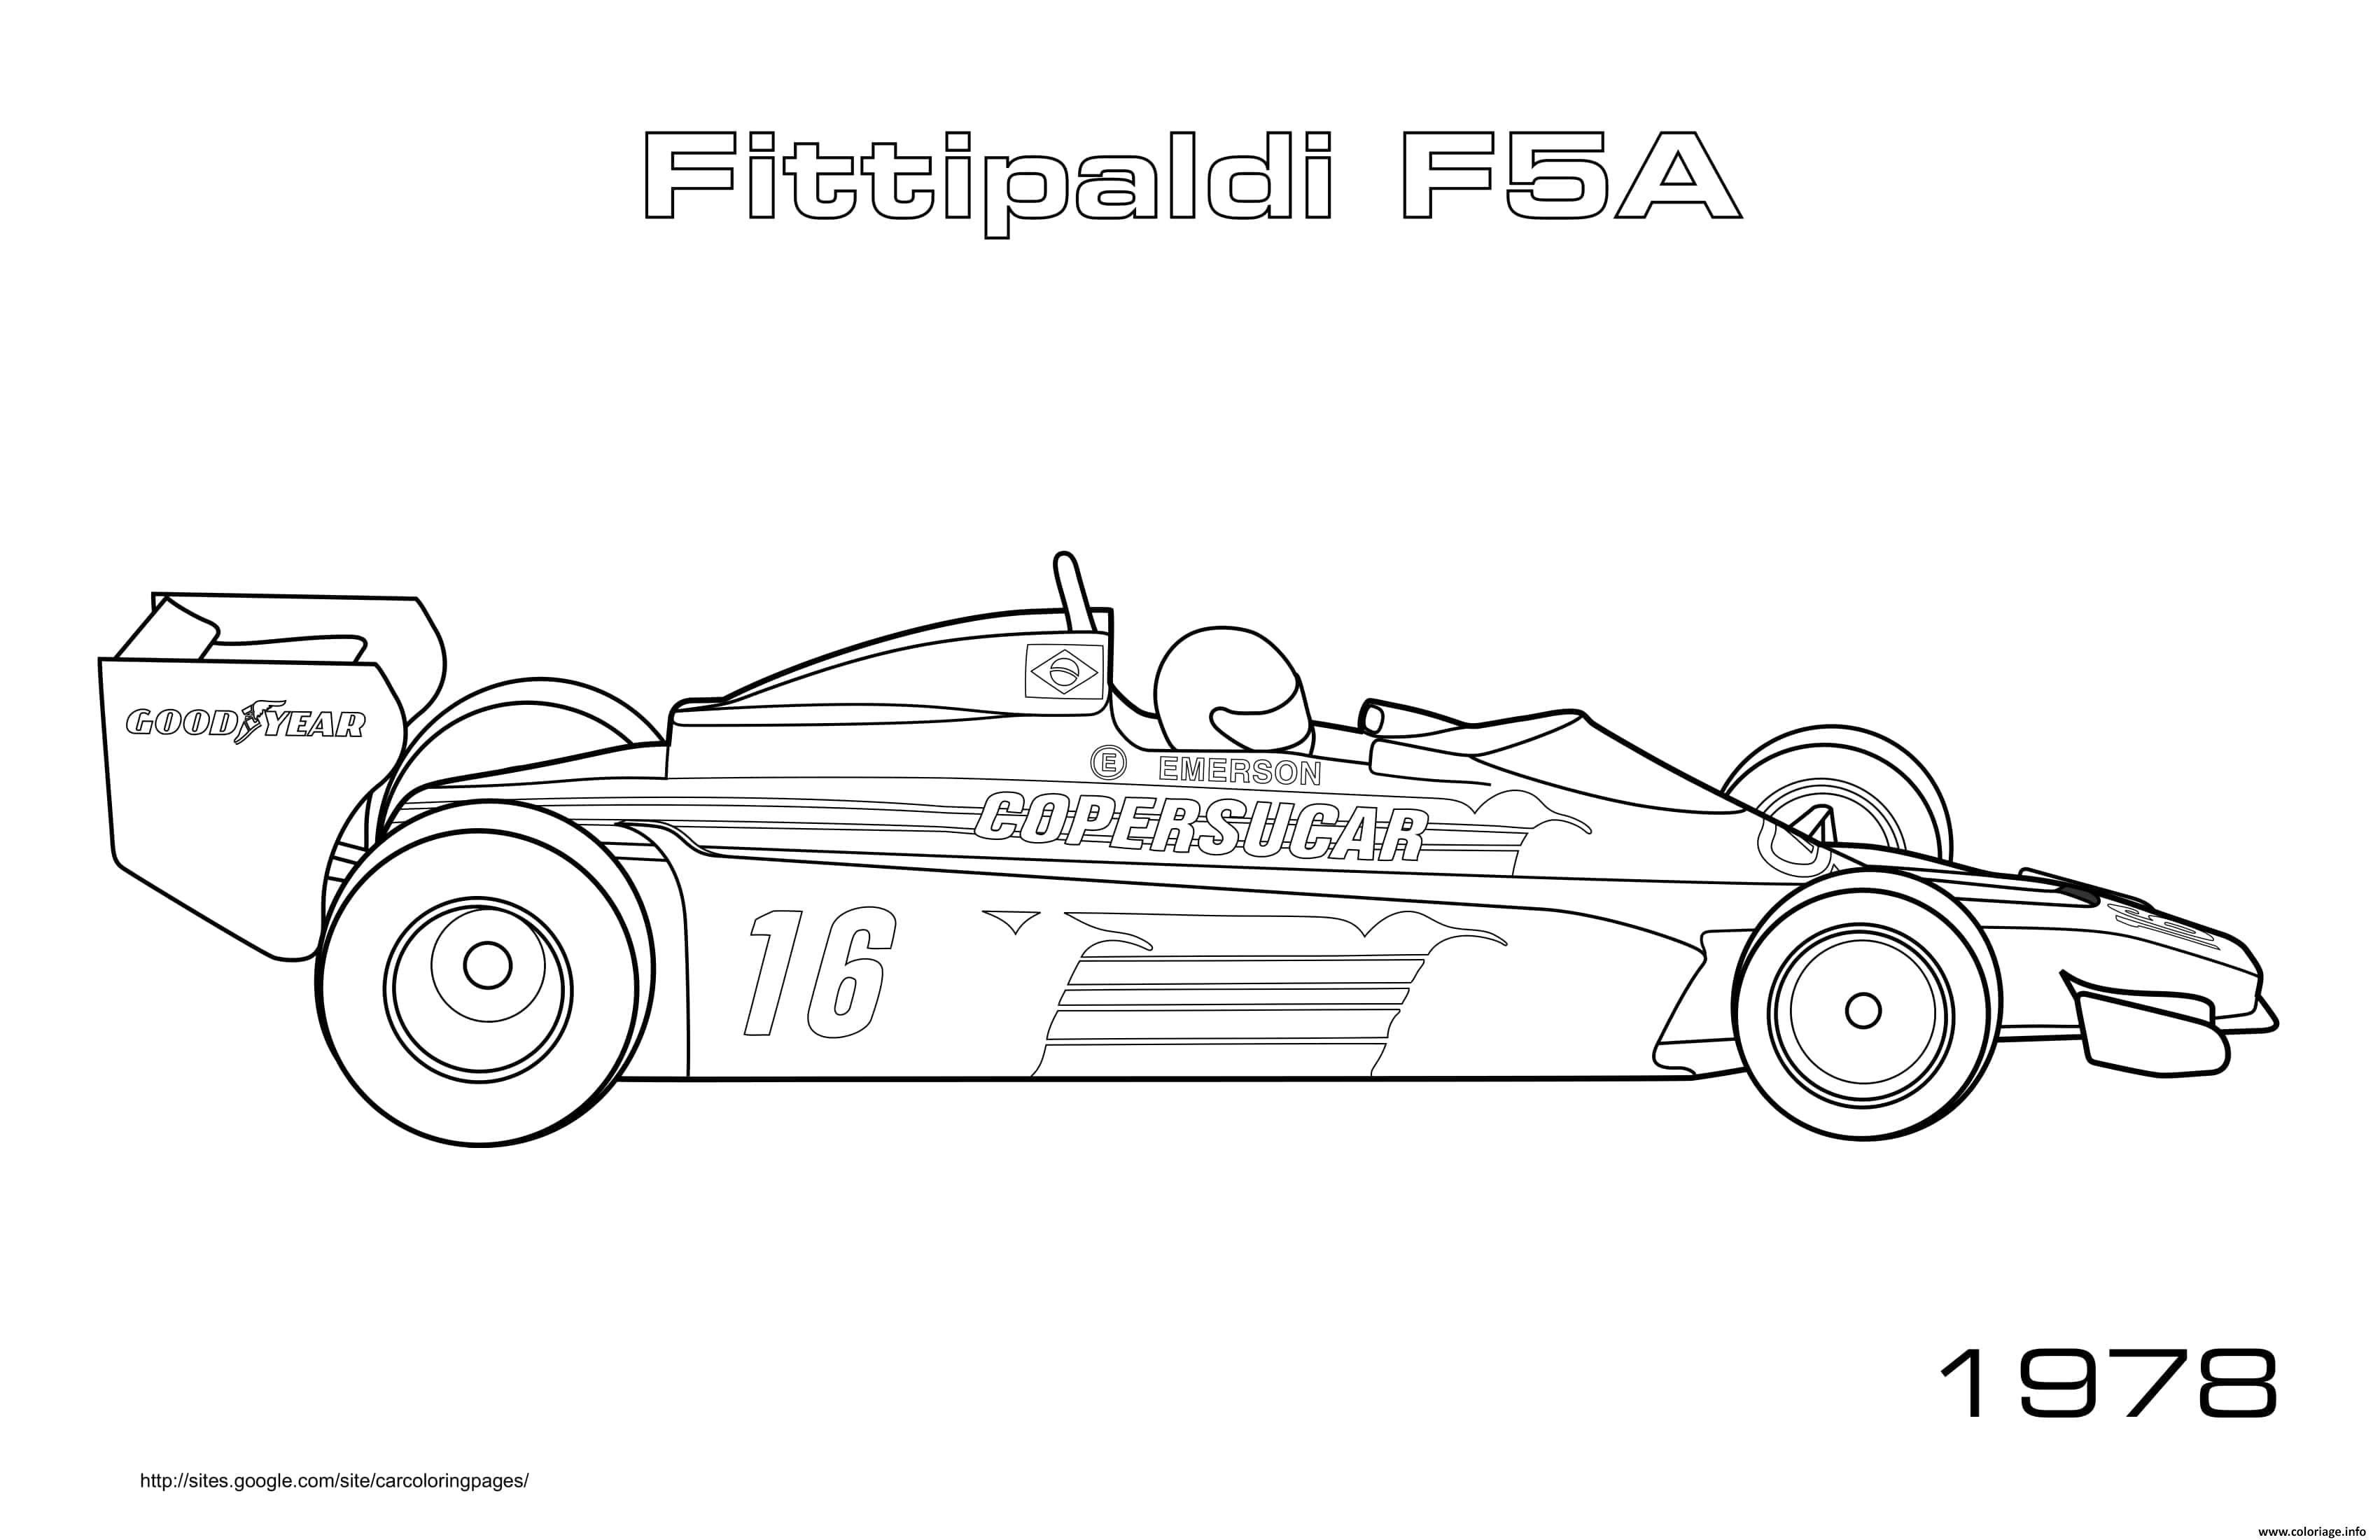 Dessin Formule 1 Fittipaldi F5a 1978 Coloriage Gratuit à Imprimer